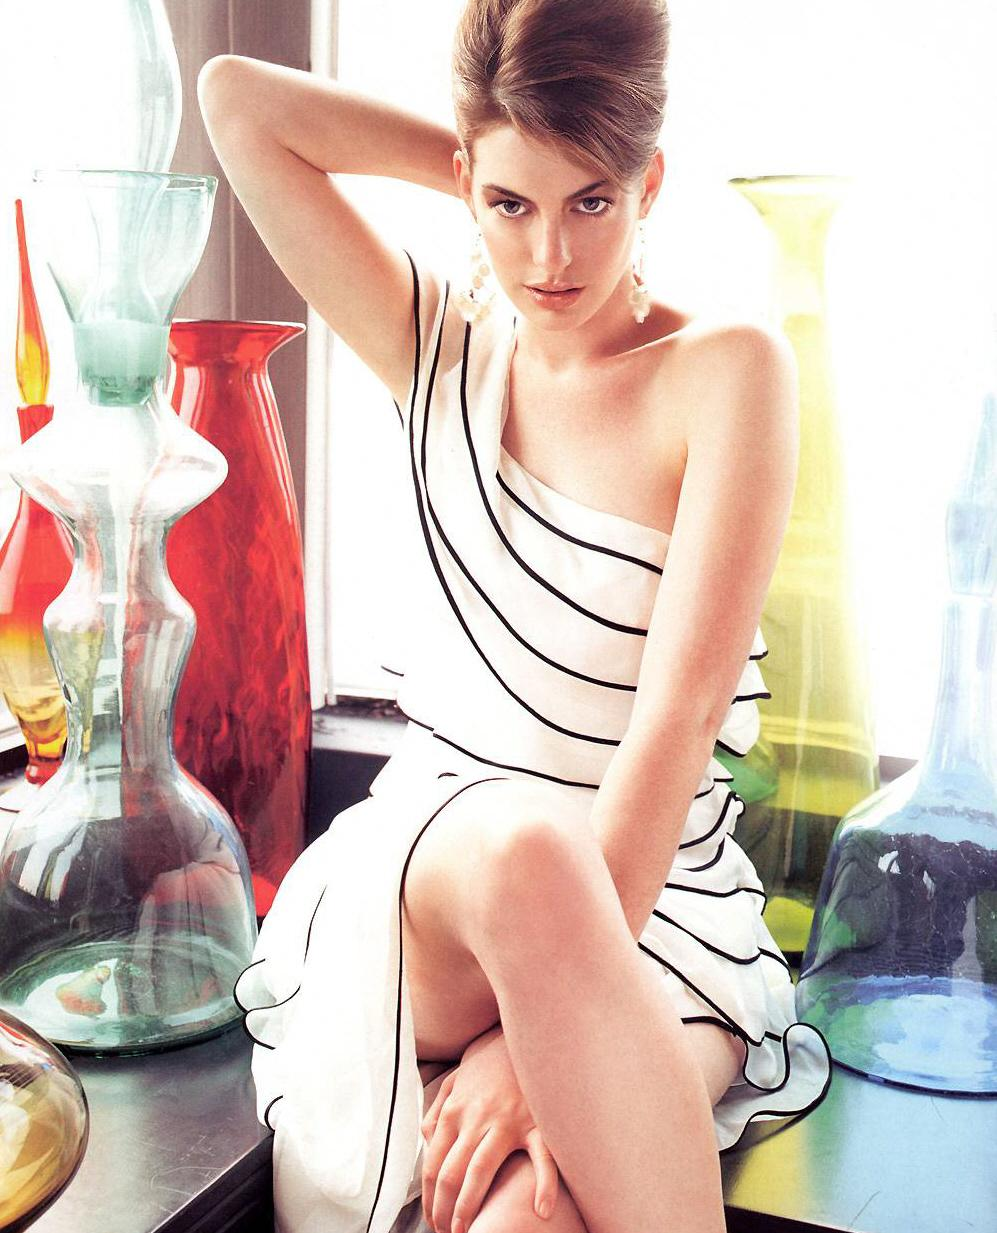 Jason Terry Tattoo: Anne Hathaway